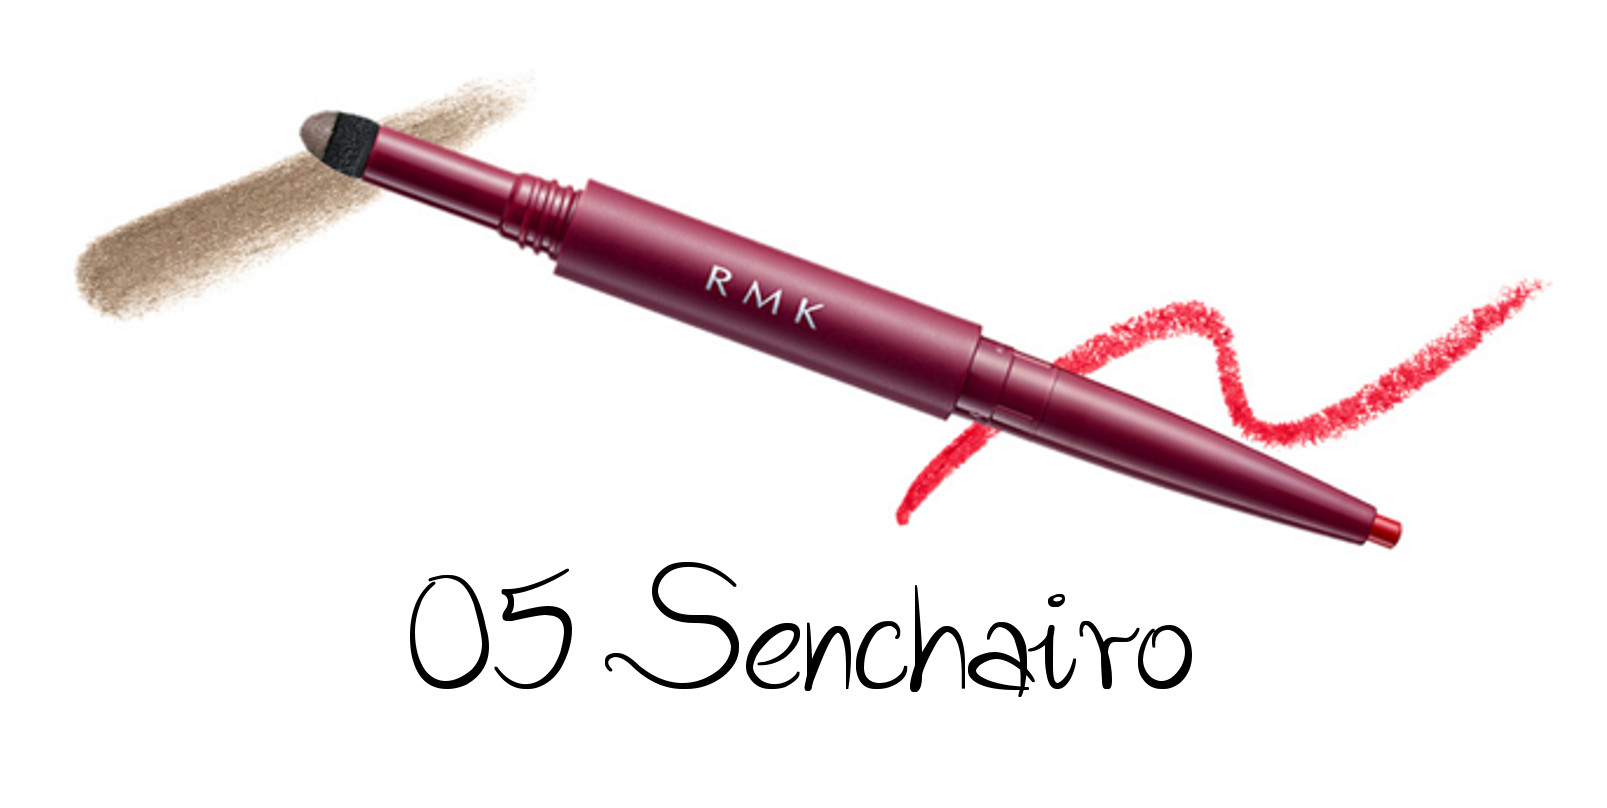 RMK Autumn Winter Collection 2020 Kiseru W Liner 05 Senchairo